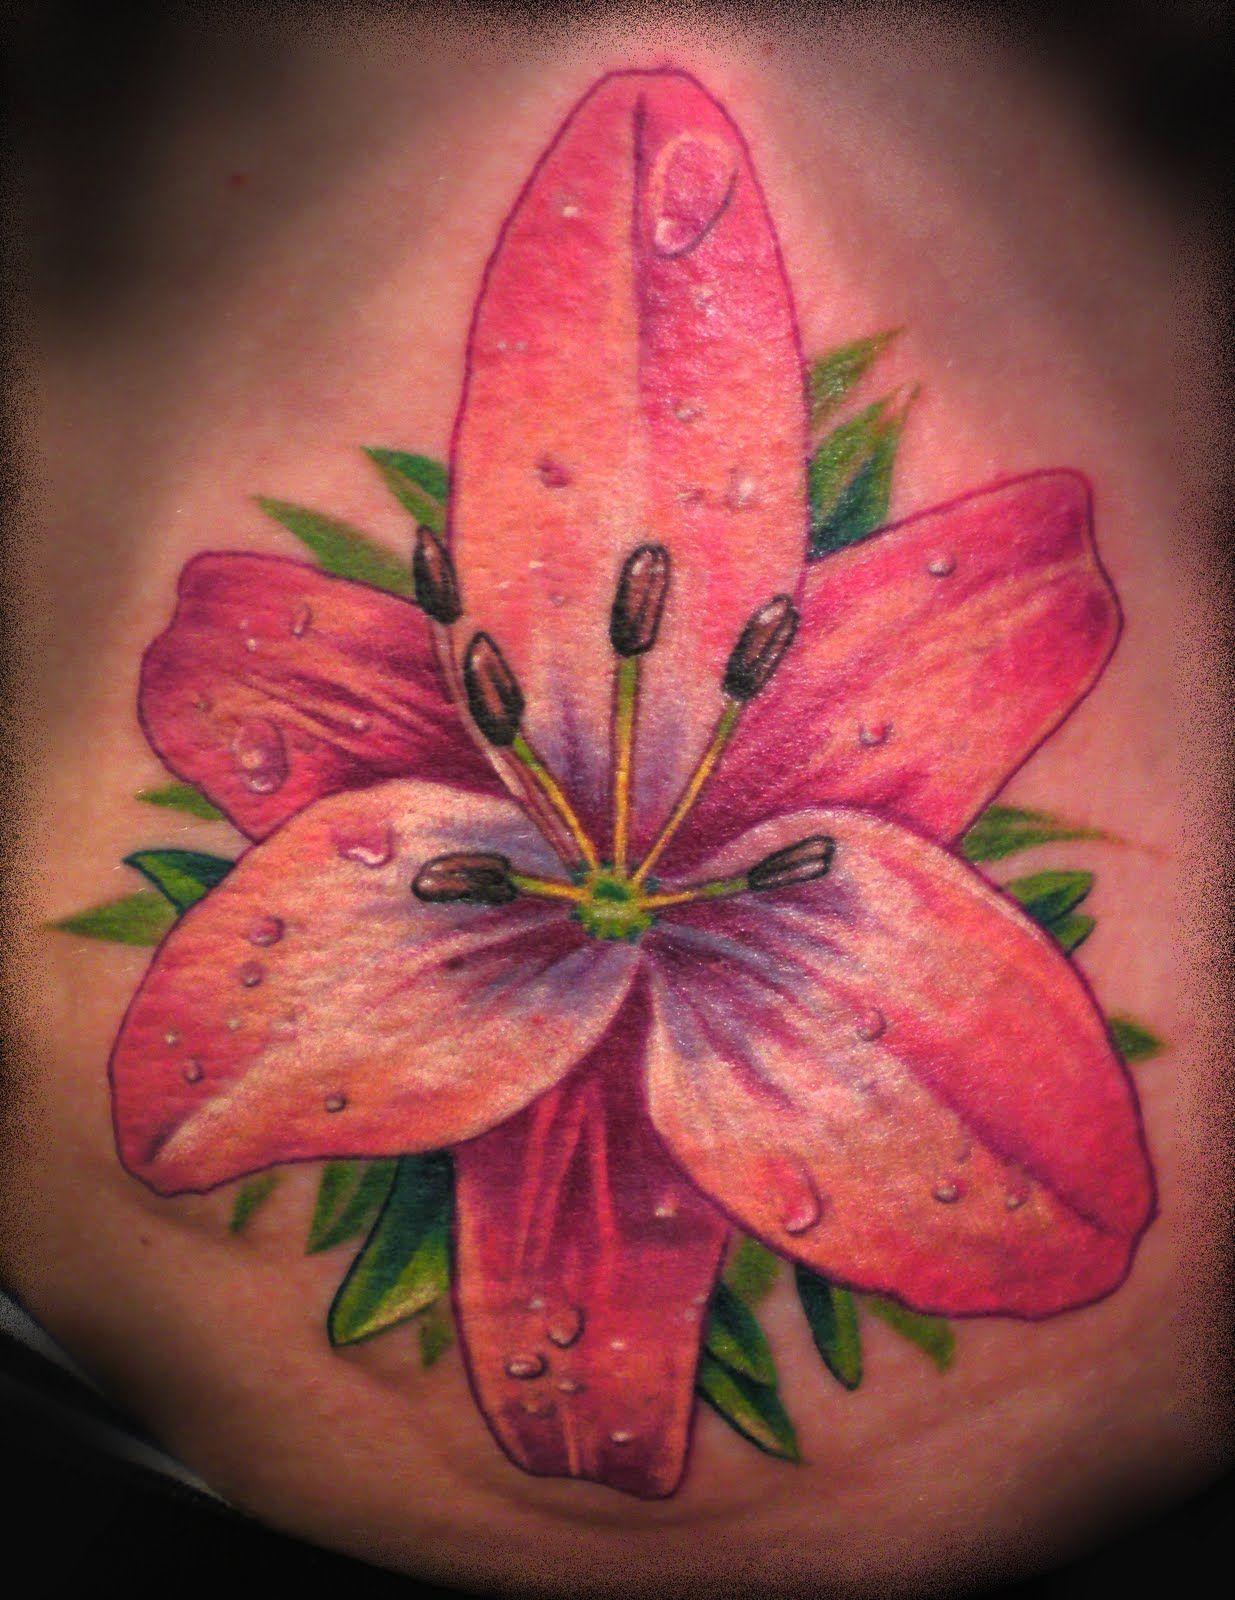 Pin By Rebekah Thompson On My New Tattoo Pinterest Tattoo